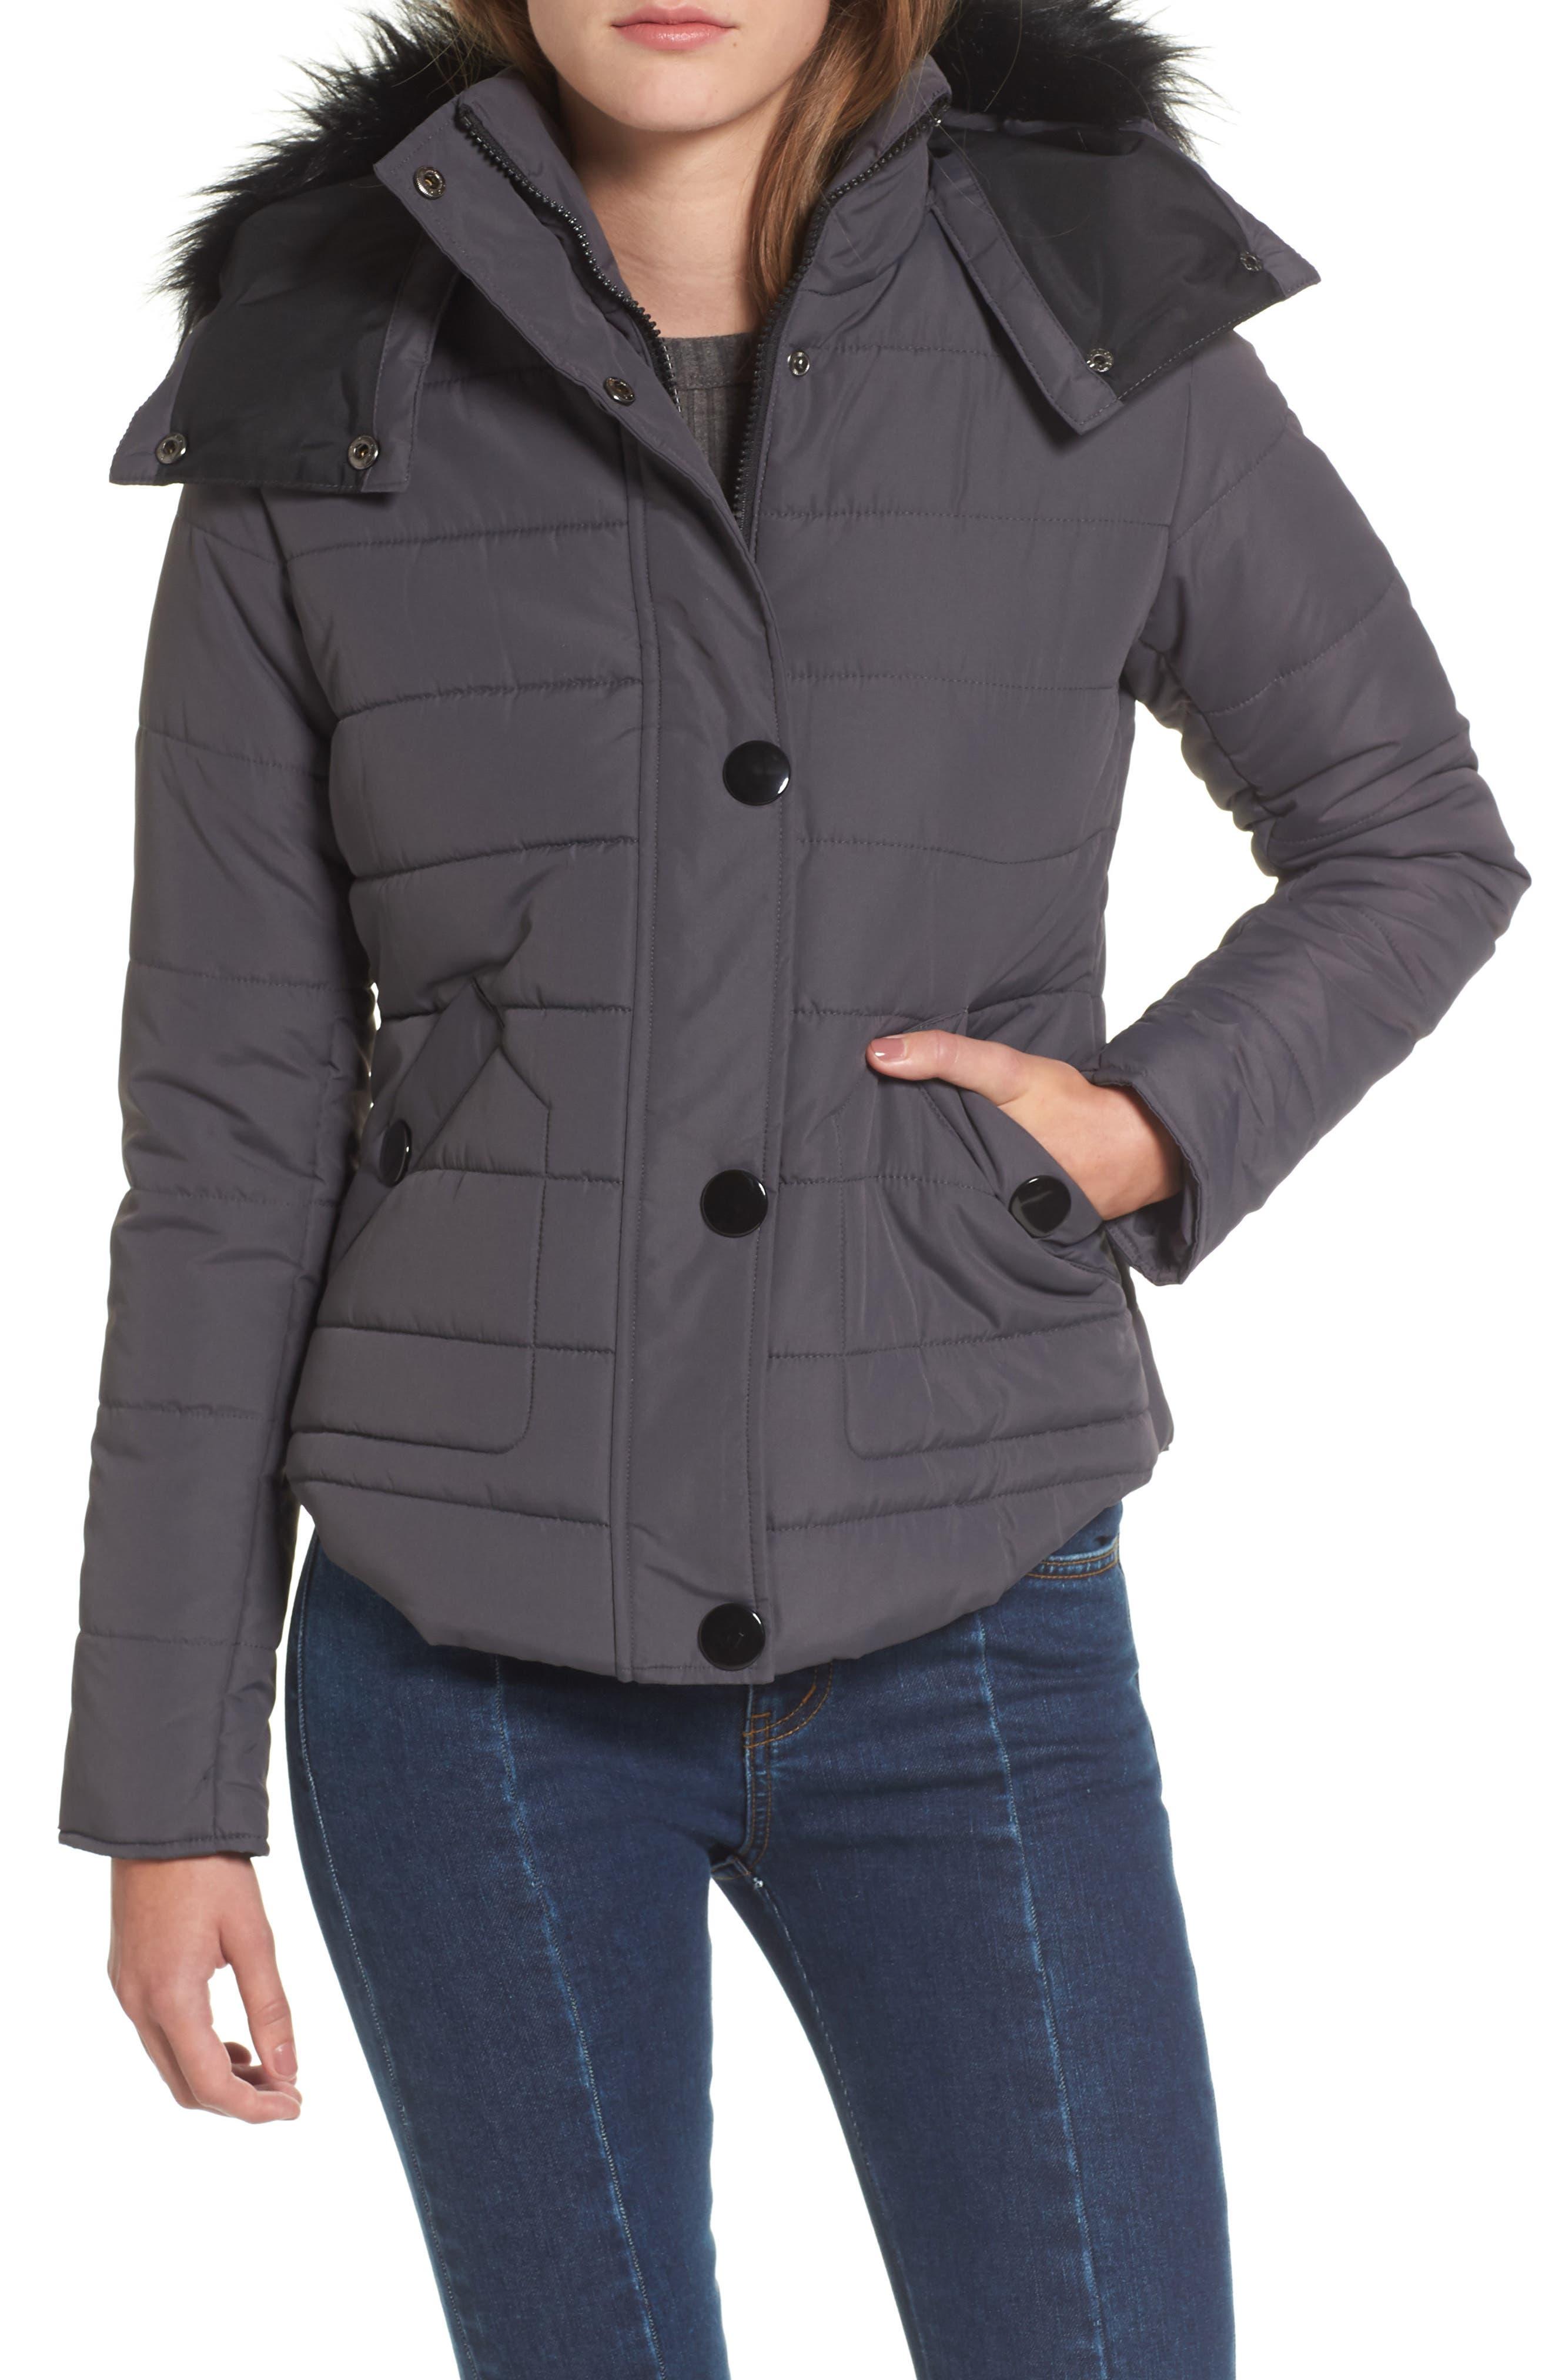 Maralyn & Me Faux Fur Trim Hooded Puffer Jacket